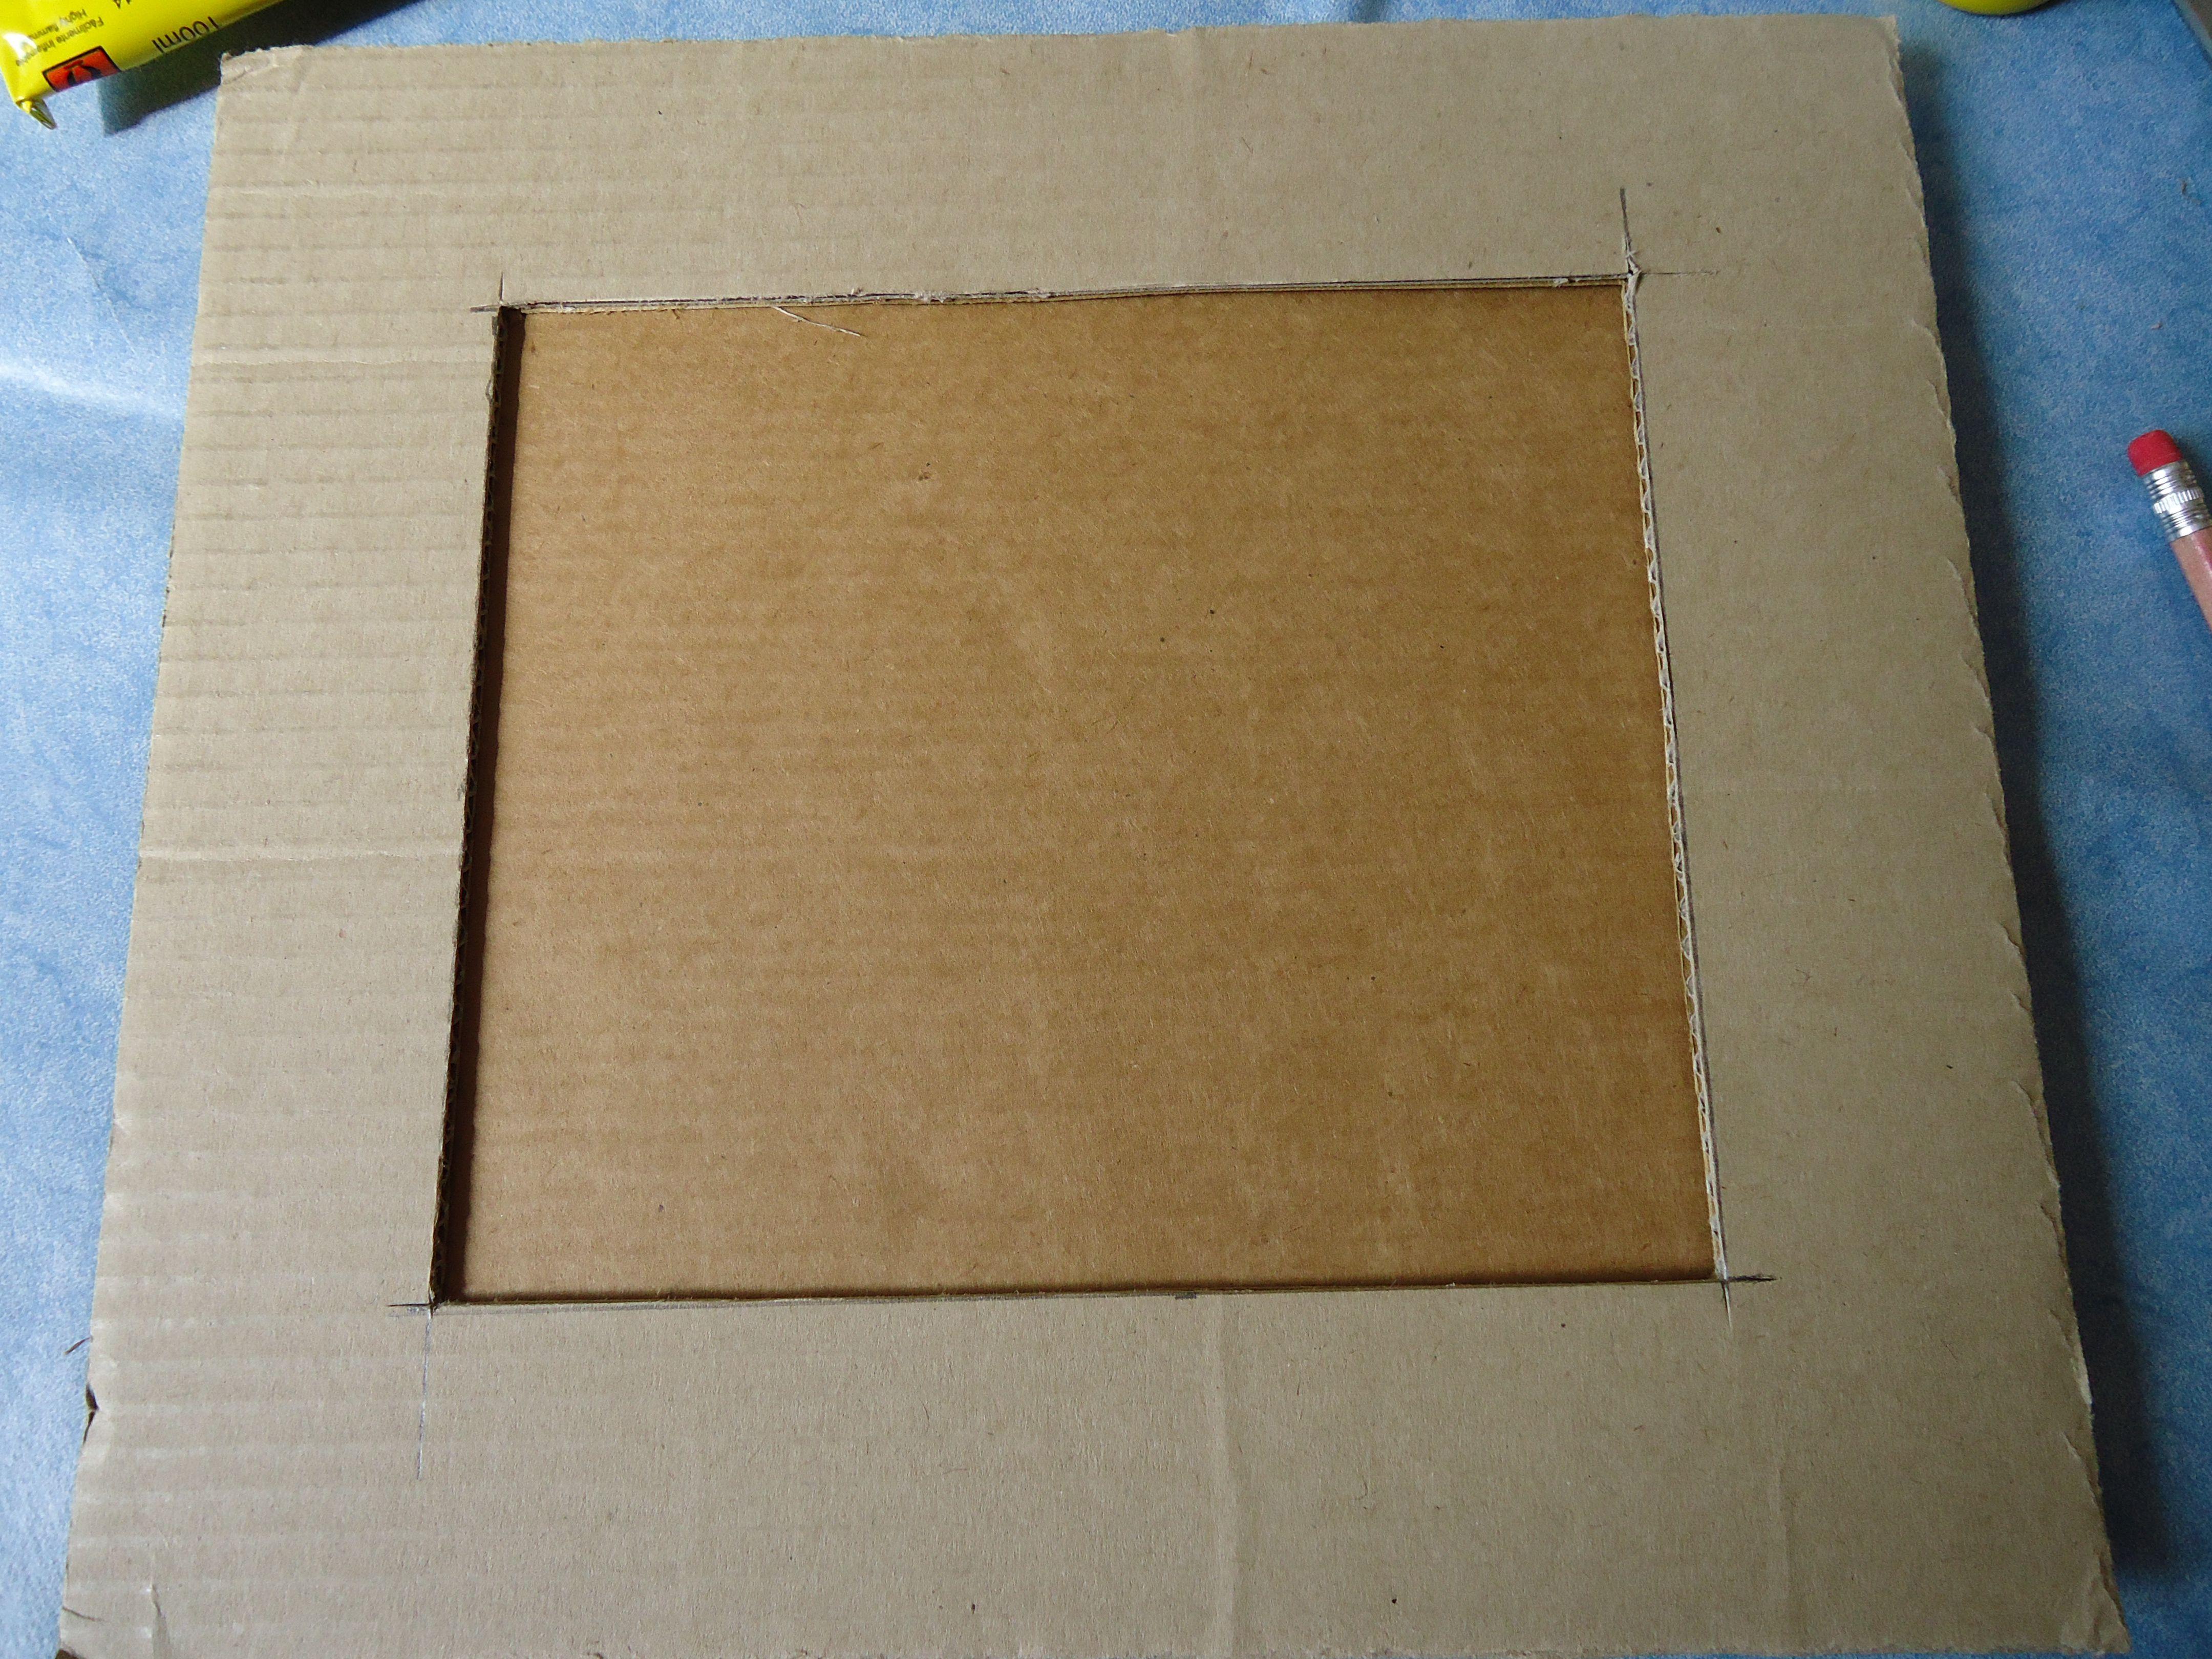 portarretratos de cartón